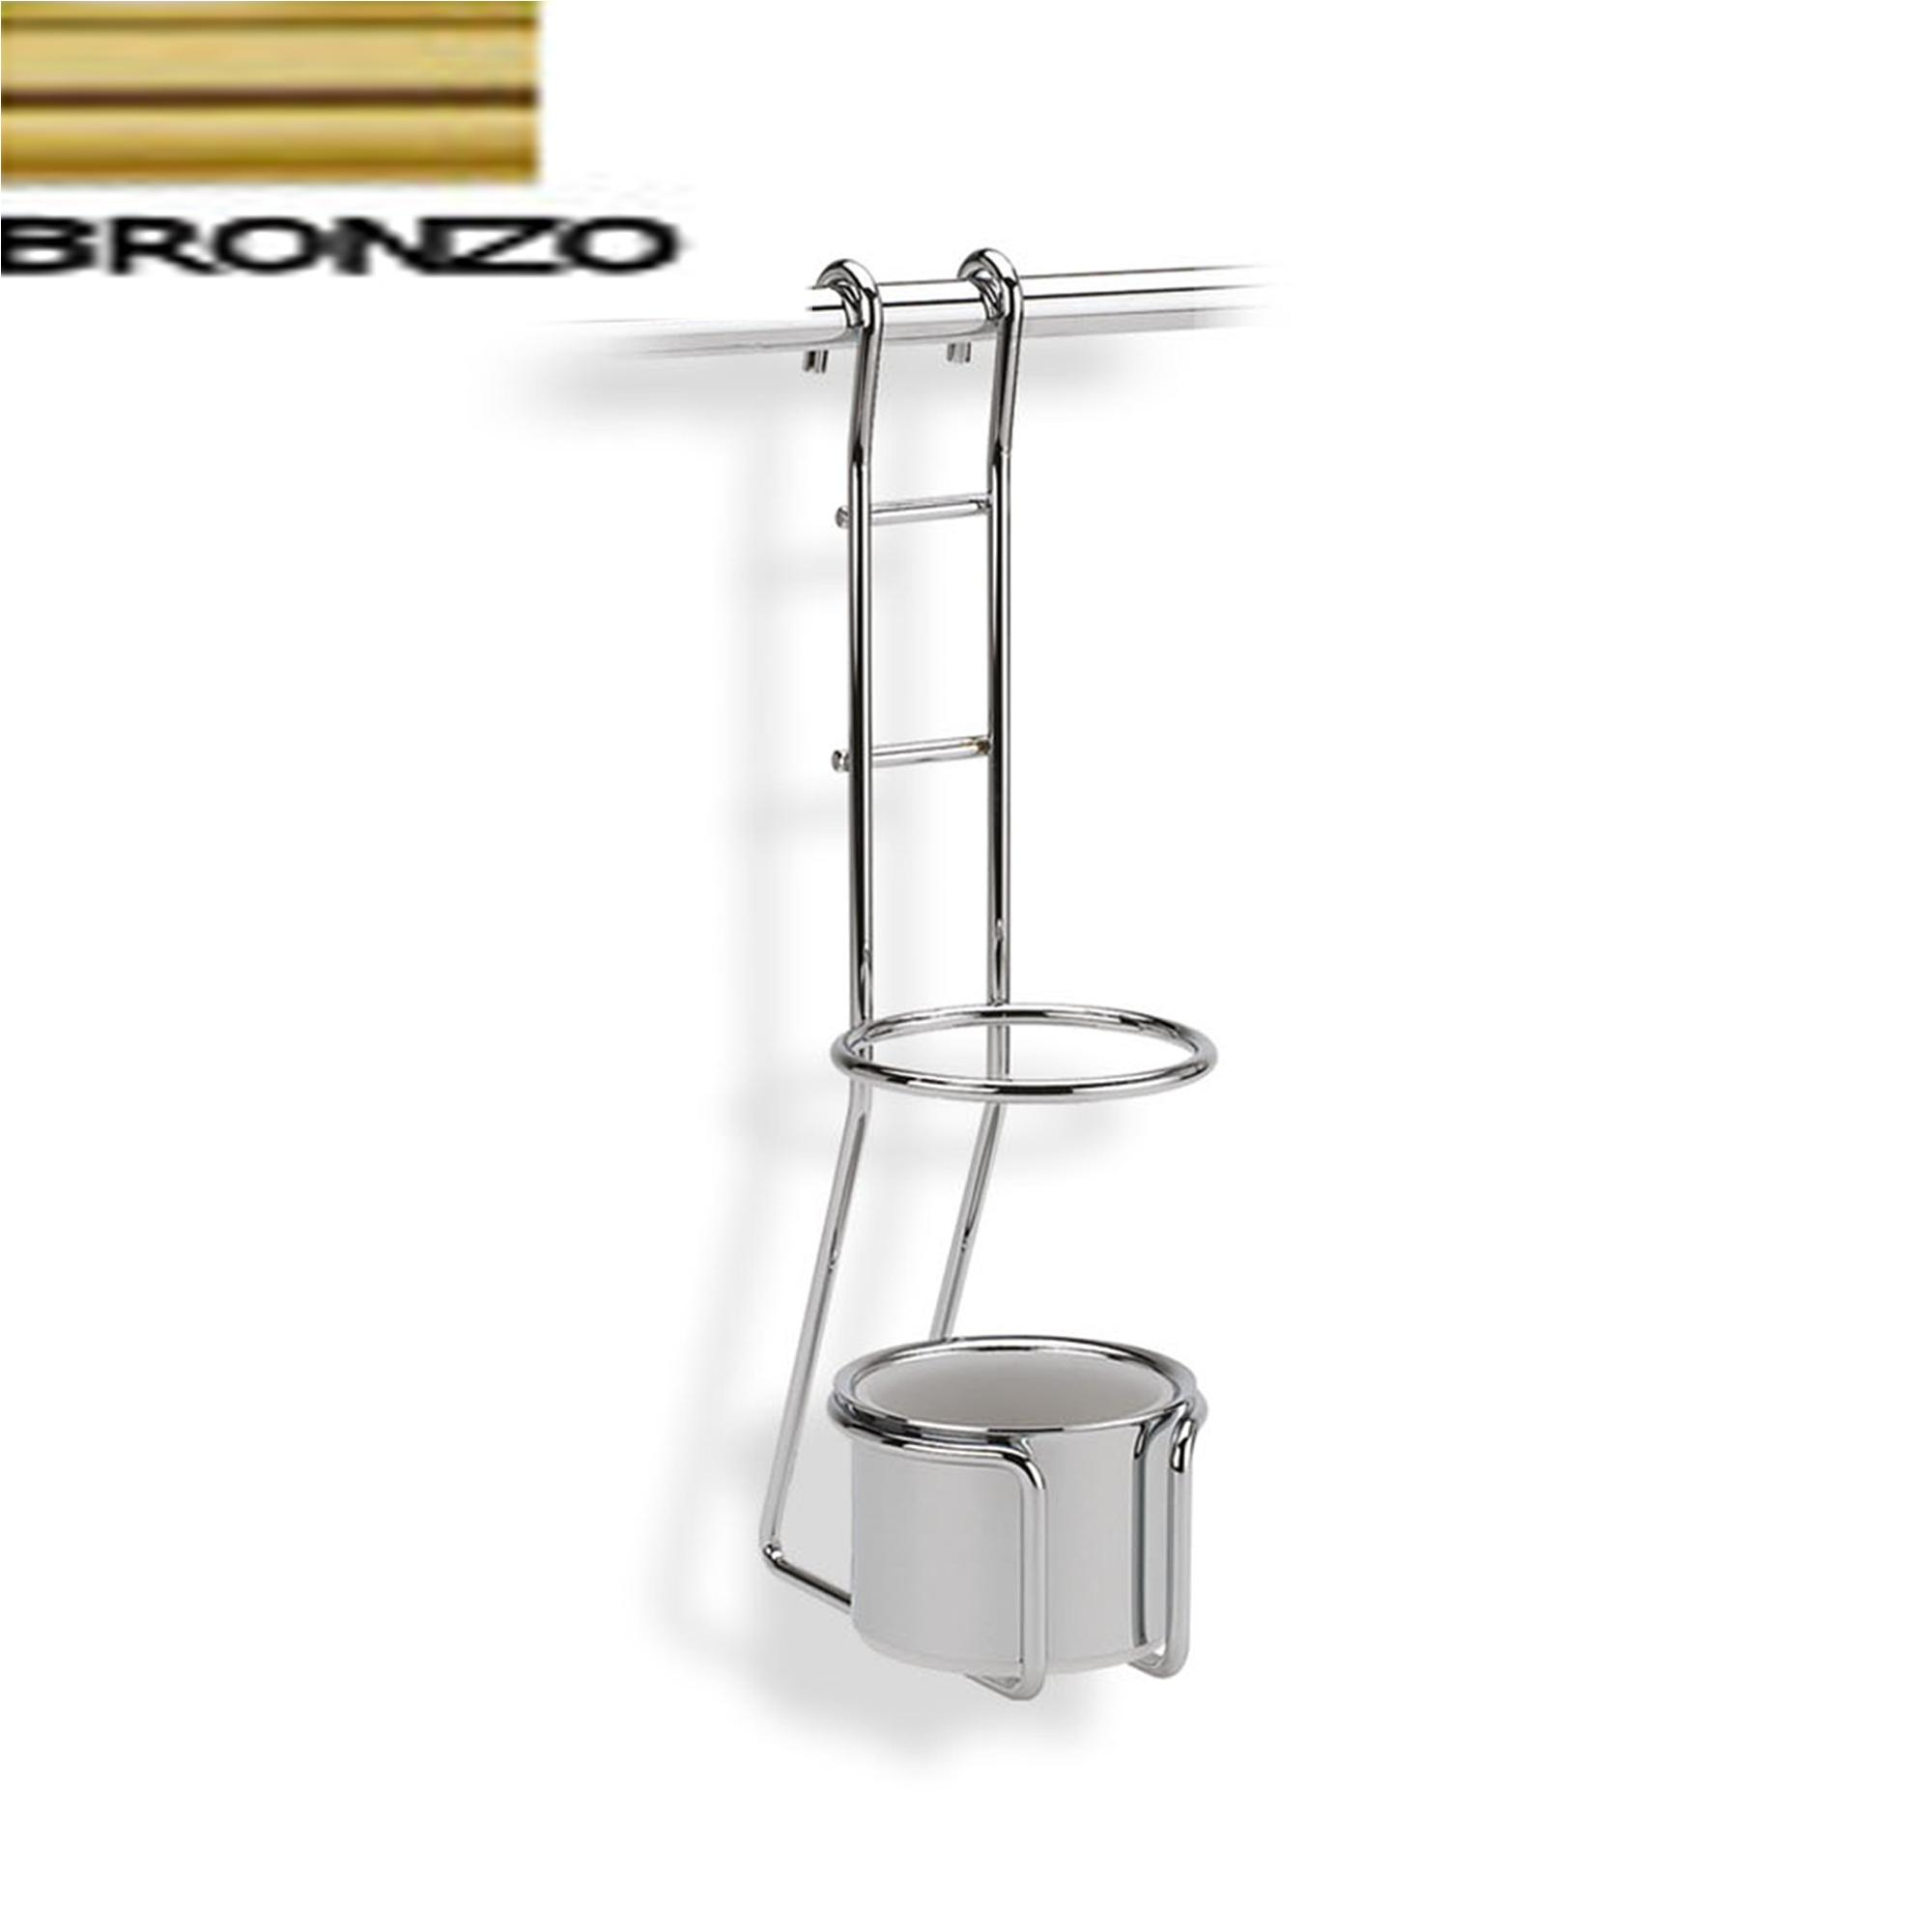 Portamestoli 14x10xh35 cm applicabile alla barra da cucina for Kit utensili da cucina